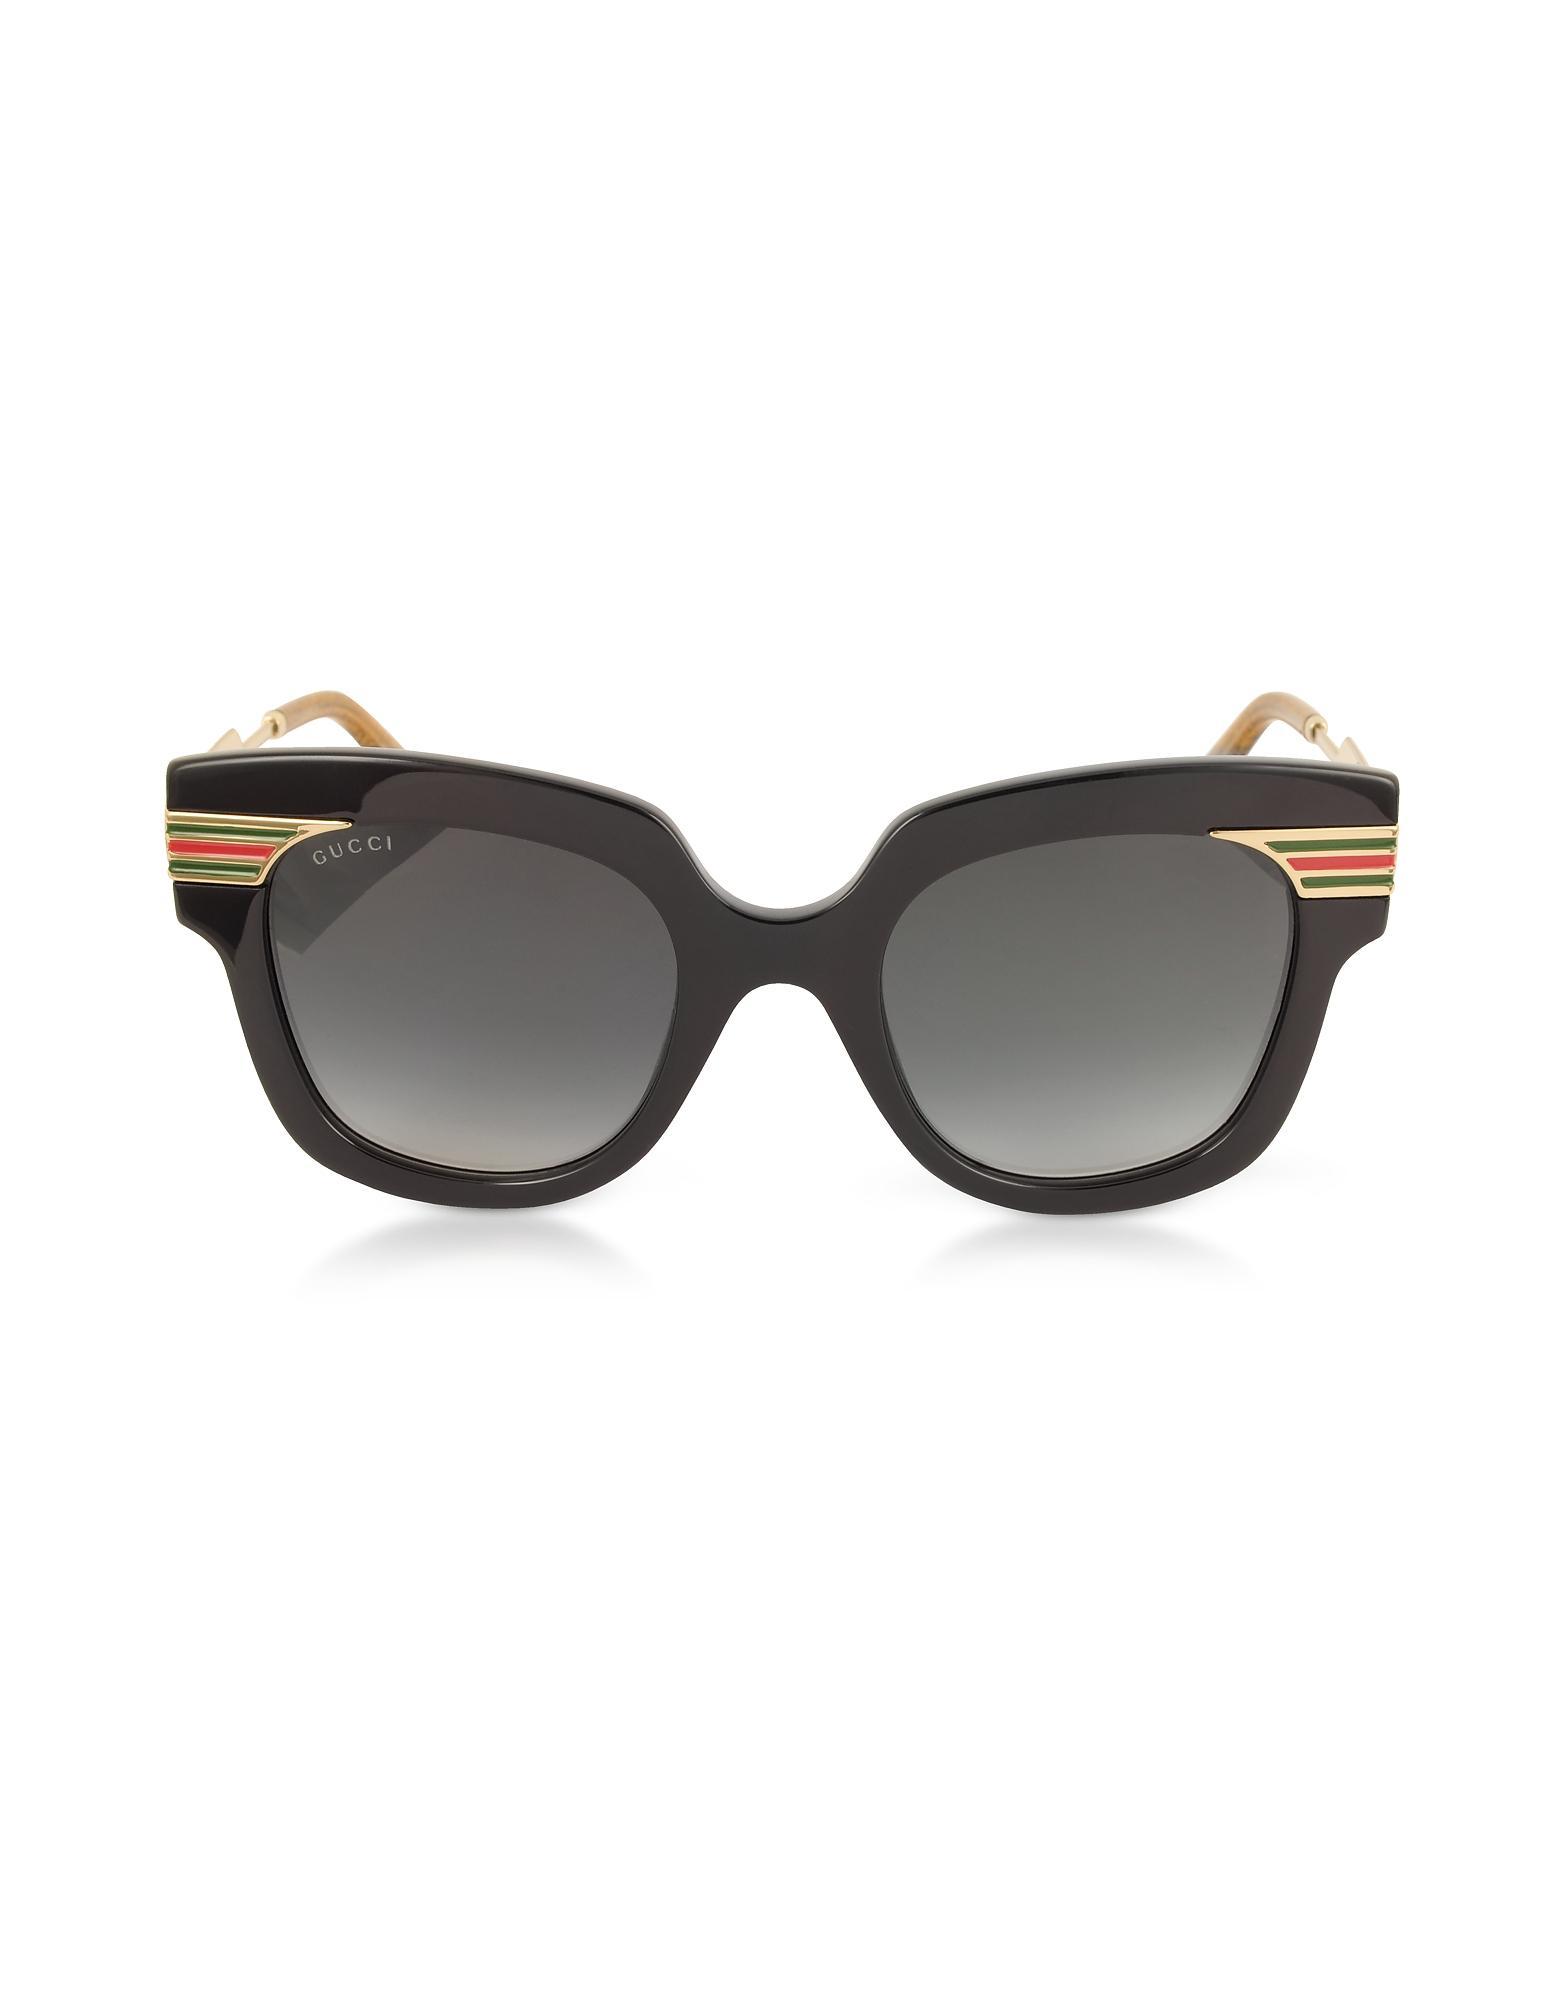 9b086add93 Lyst - Gucci GG0281S Square-frame Black Acetate Sunglasses W sylvie ...